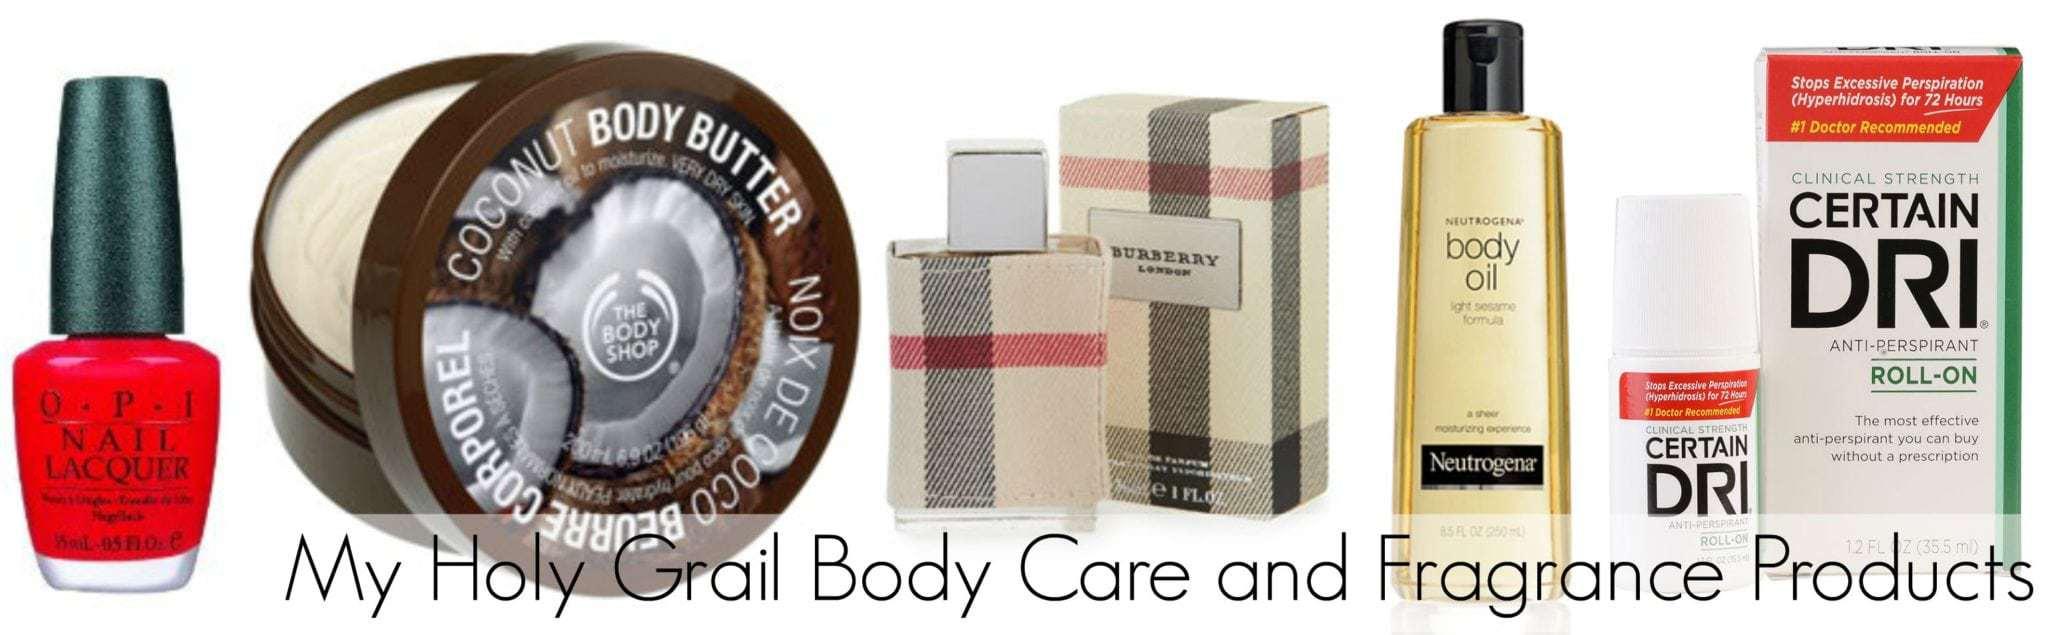 Wardrobe Oxygen Holy Grail Body Care Fragrance Beauty Products